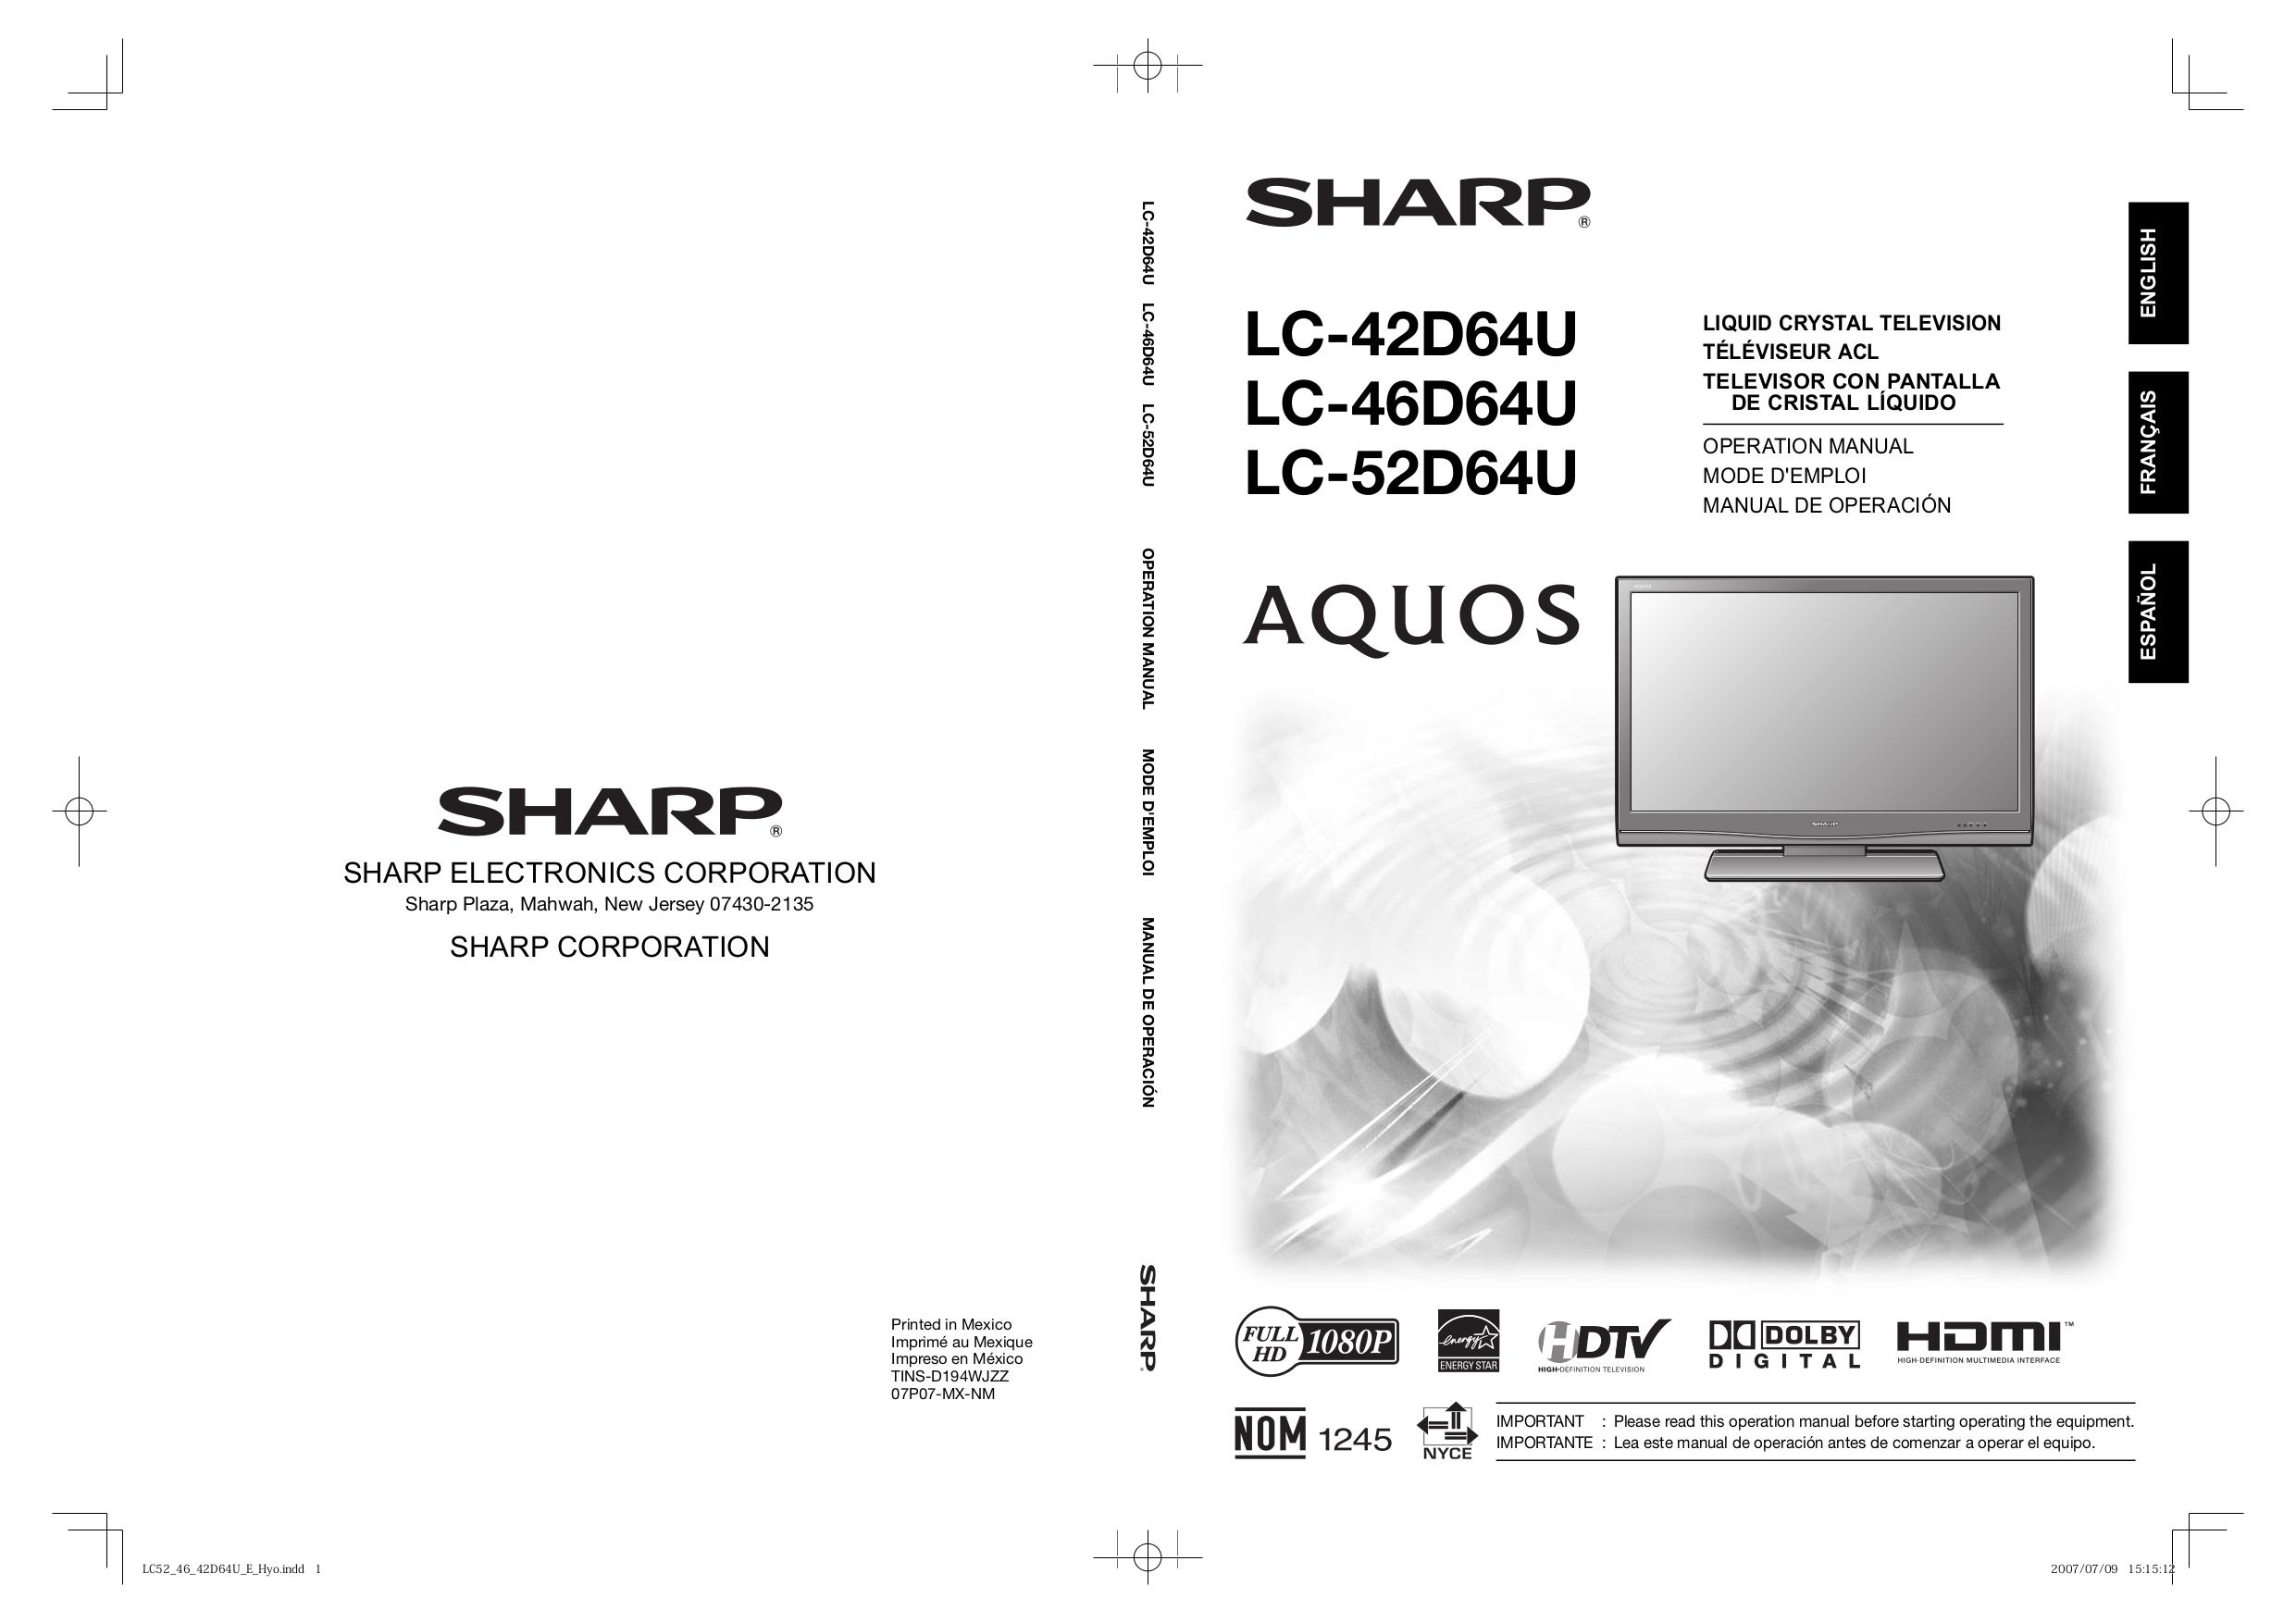 download free pdf for sharp aquos lc 52d64u tv manual rh umlib com No Power On Sharp LC-52D64U sharp aquos lc-52d64u manual